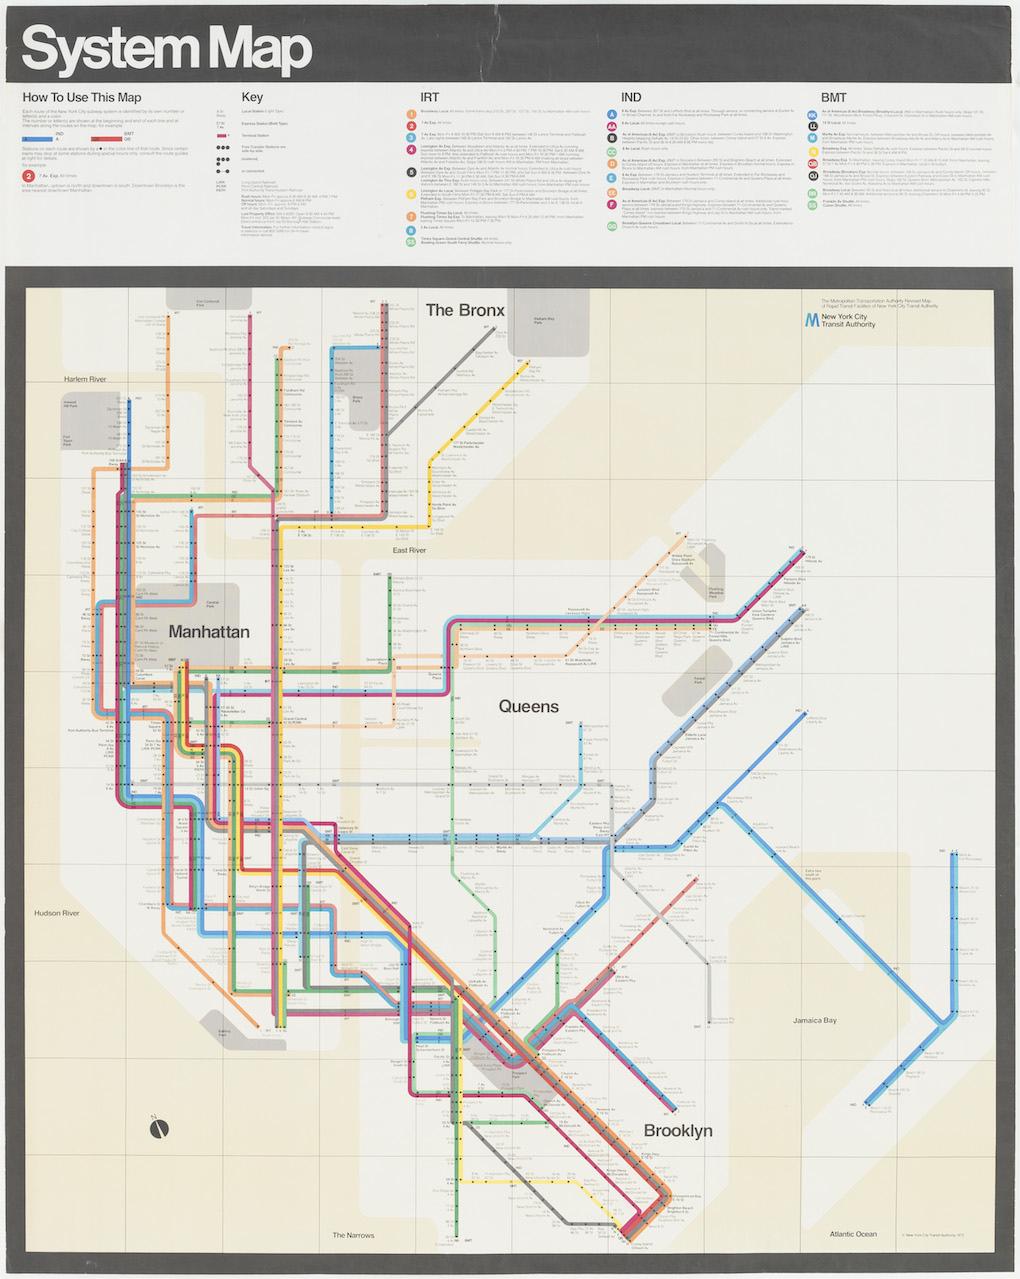 Massimo Vignelli Subway Map Connections.Massimo Vignelli Wiliam Blog